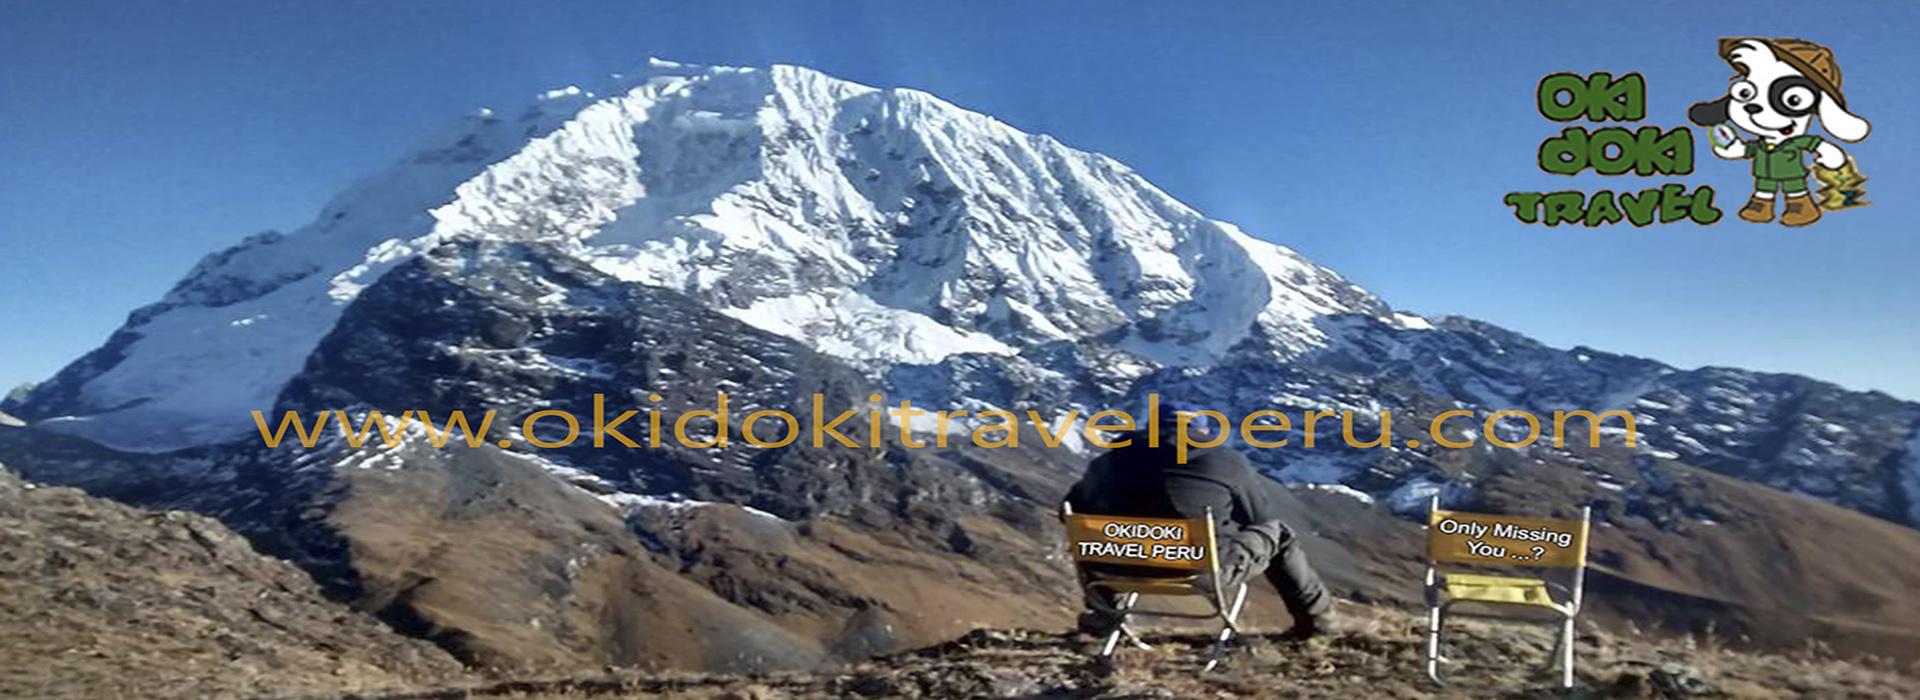 Salkantay Trek to Machu Picchu 5 days return by train last day